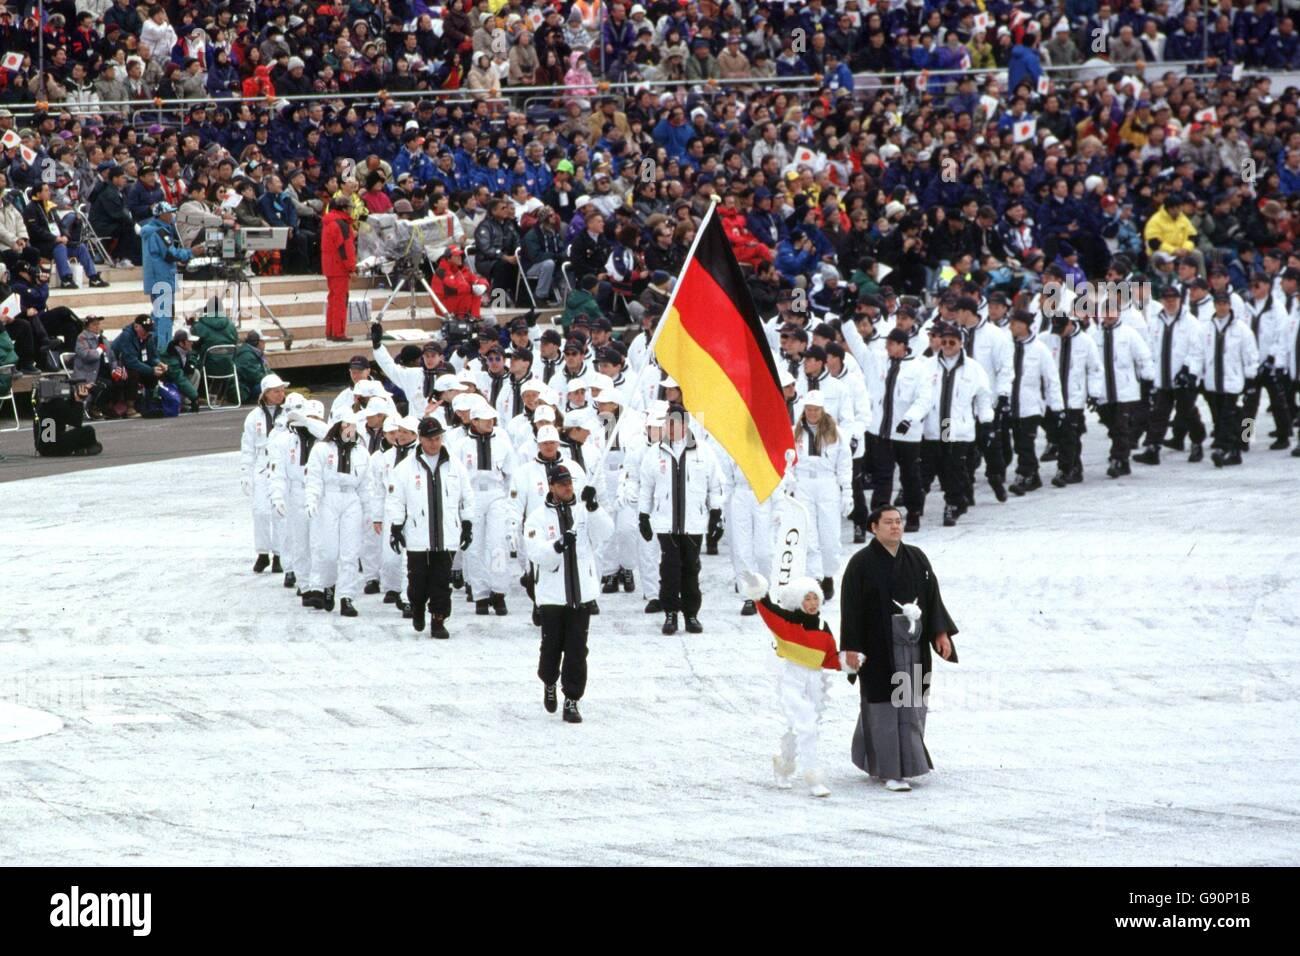 winter-olympics-nagano-1998-opening-cere